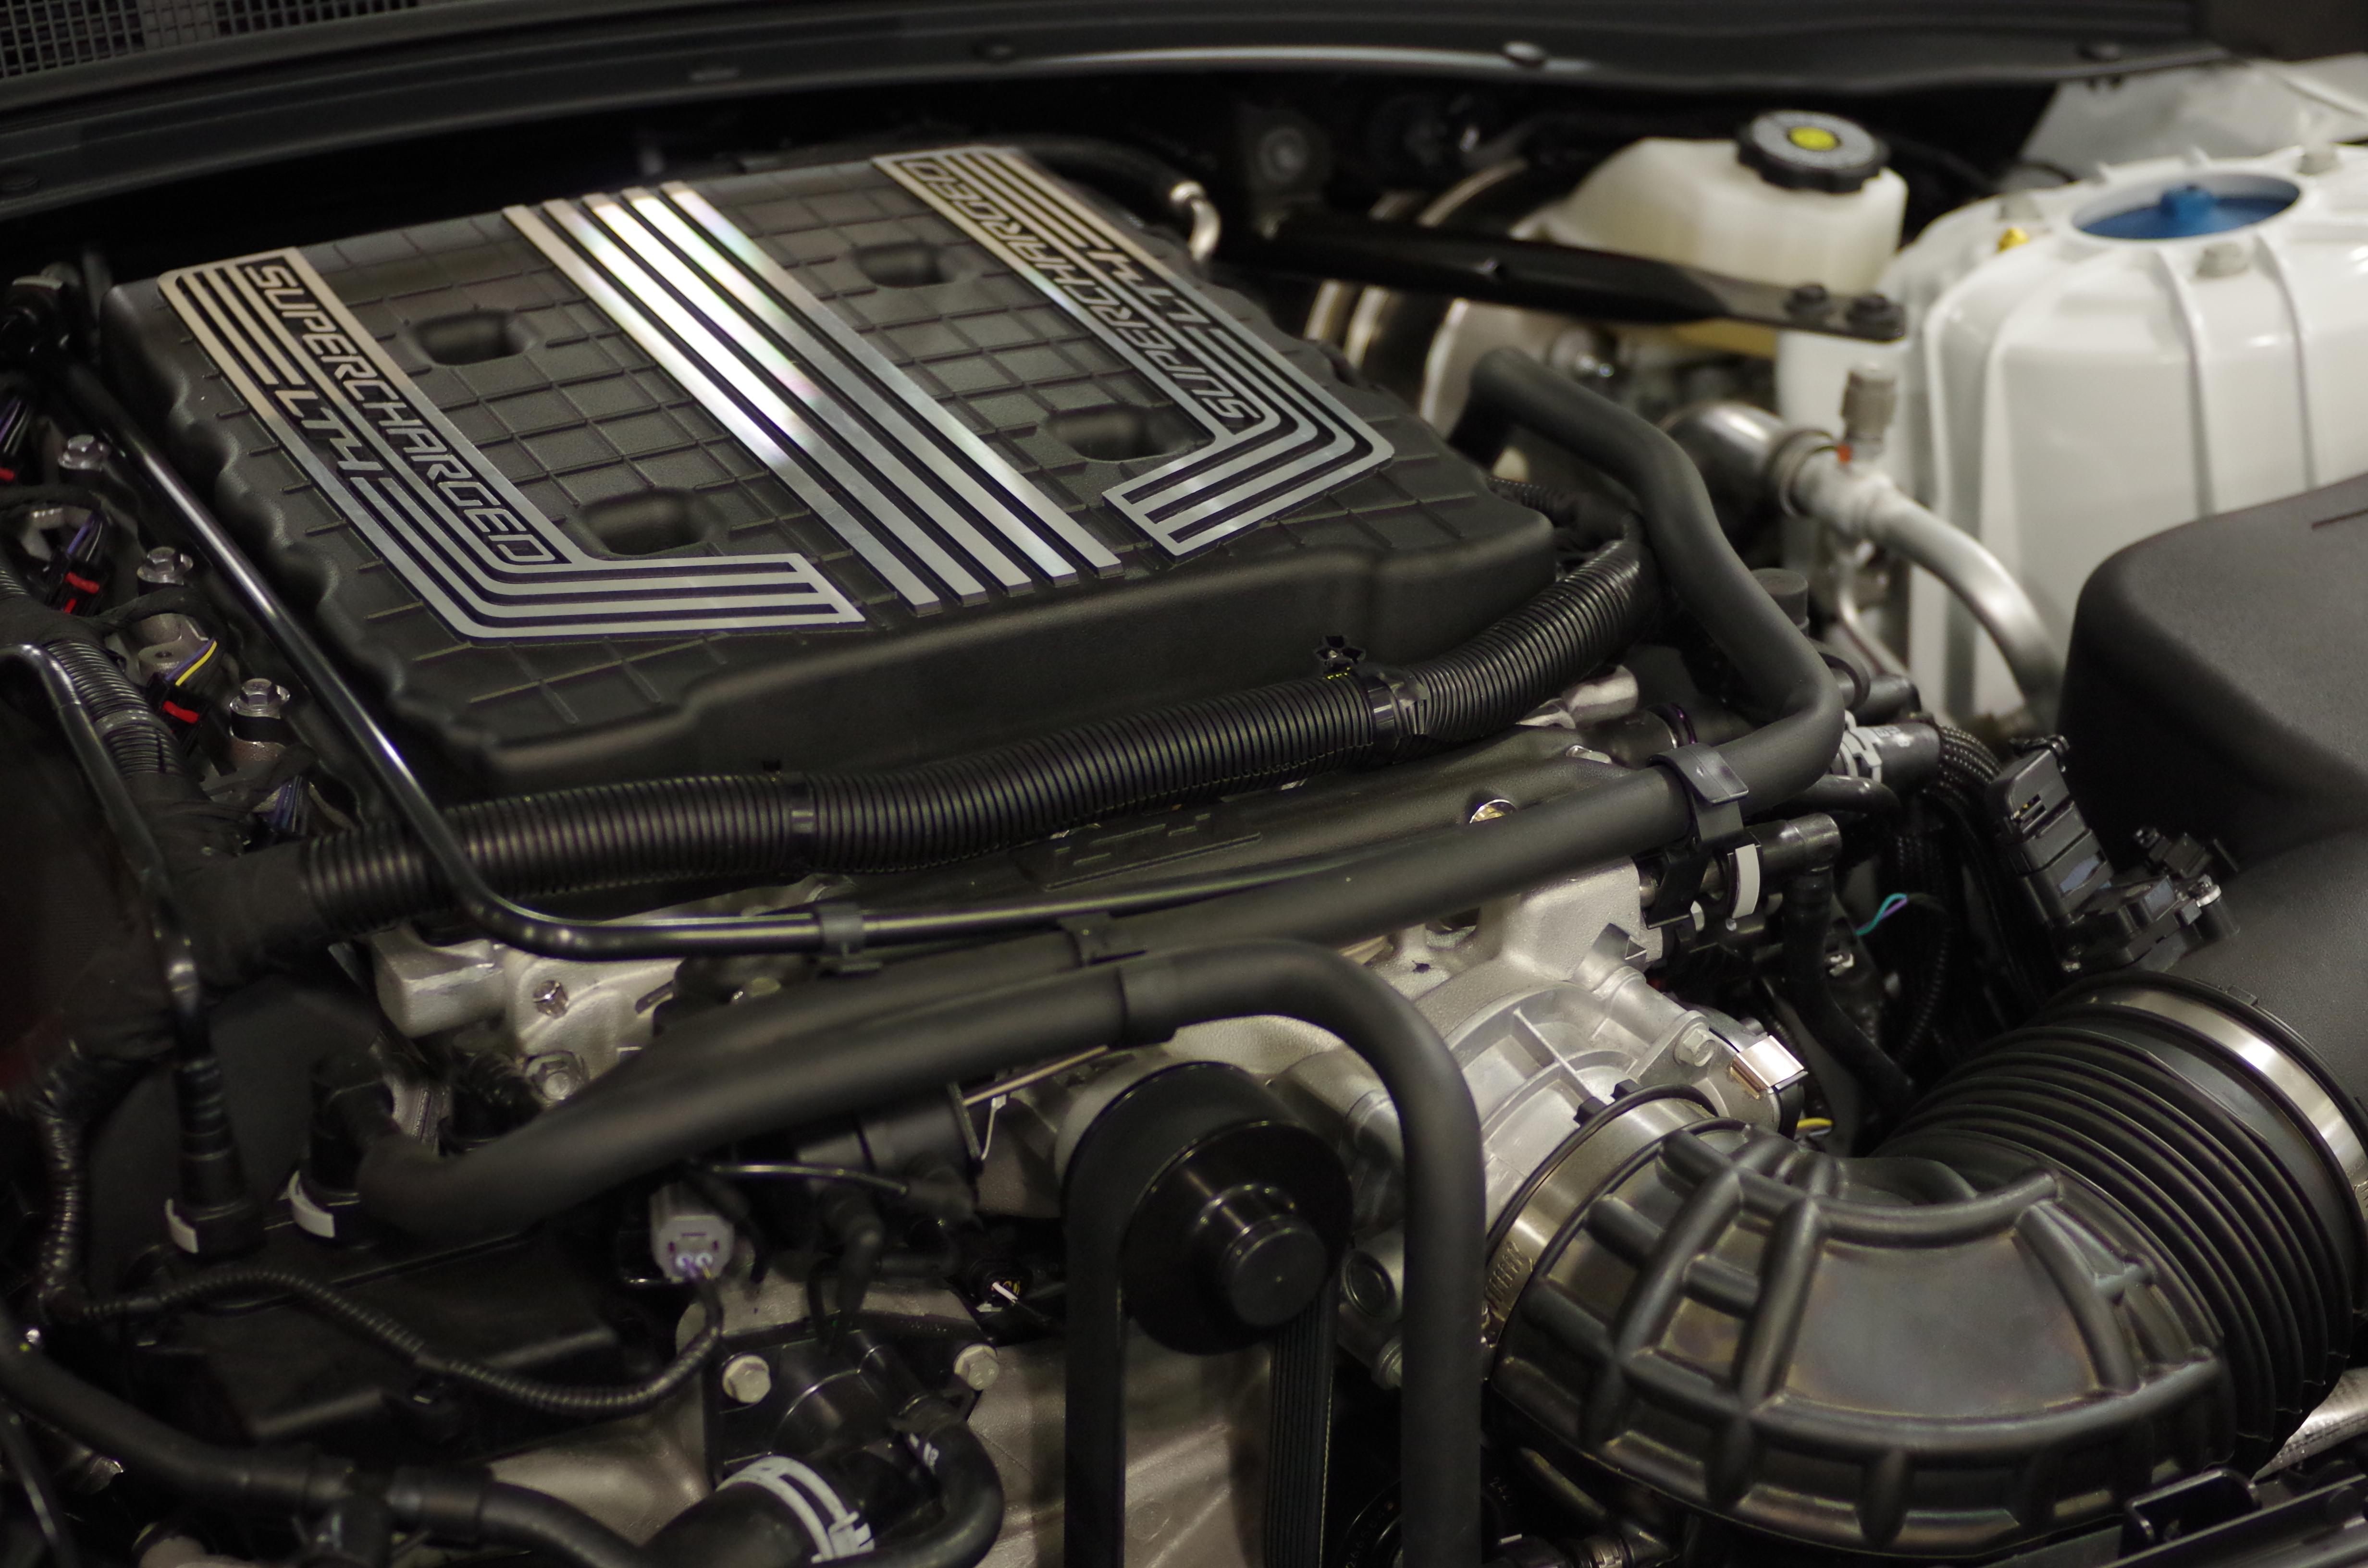 File:Camaro LZ1 Engine.jpg - Wikimedia Commons